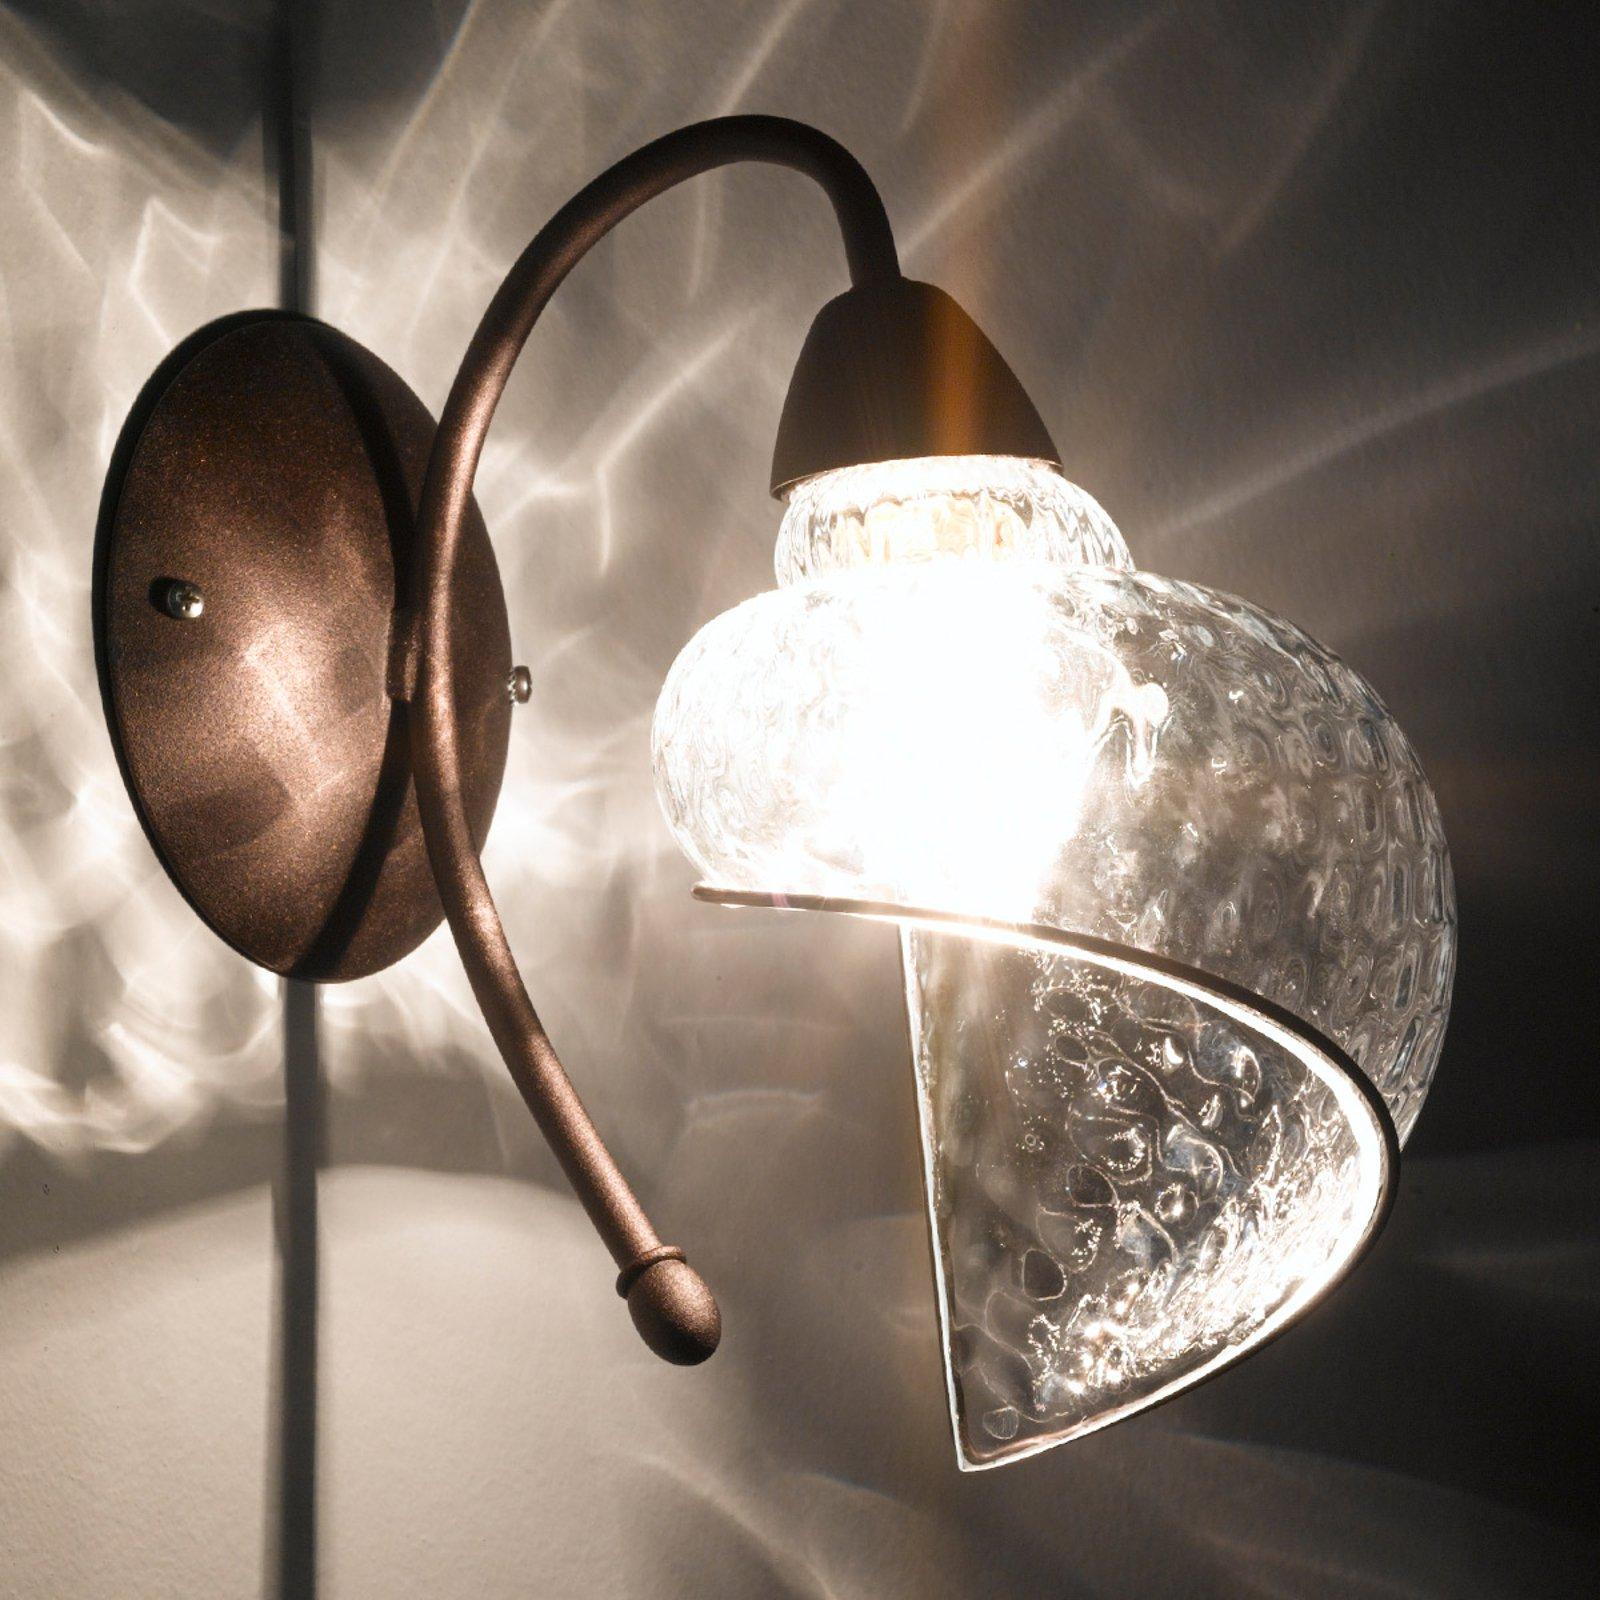 Vegglampe Chiocciola bronse, klart glass